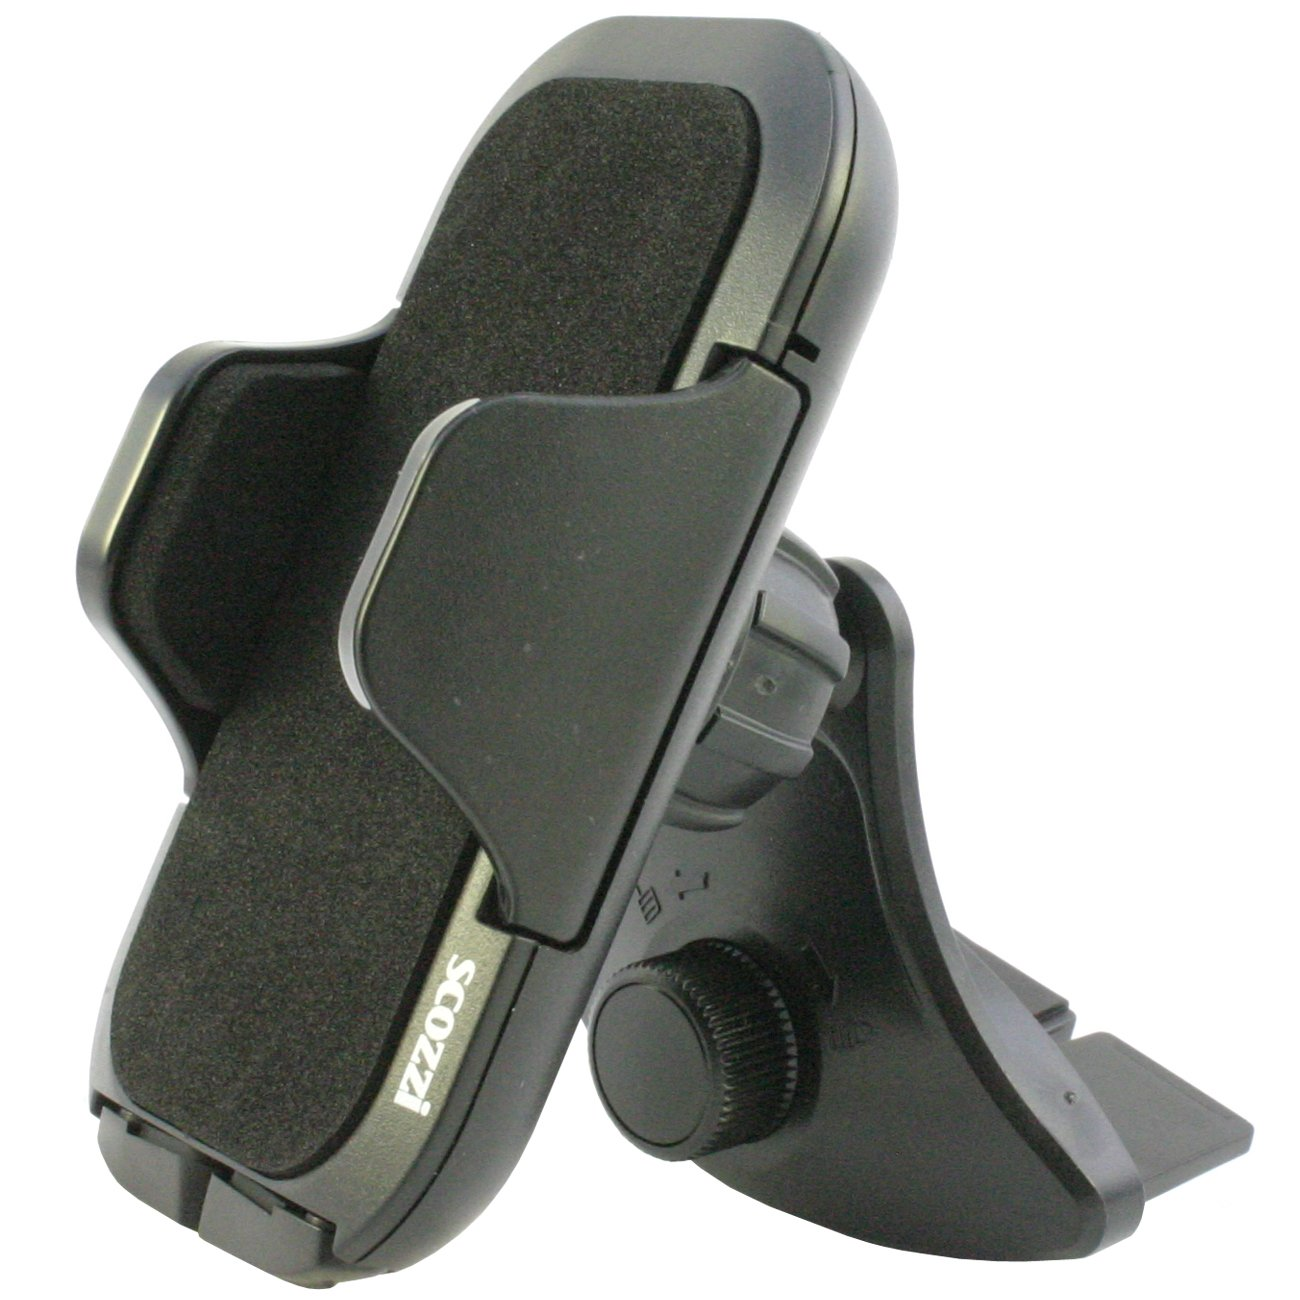 Soporte Coche Ranura CD scozzi 360° Universal Para Móvil Teléfono Smartphone Compartimiento Negro (Modelo: CD mod:4) (am11) DeineHuelle CD Slot Mod 4